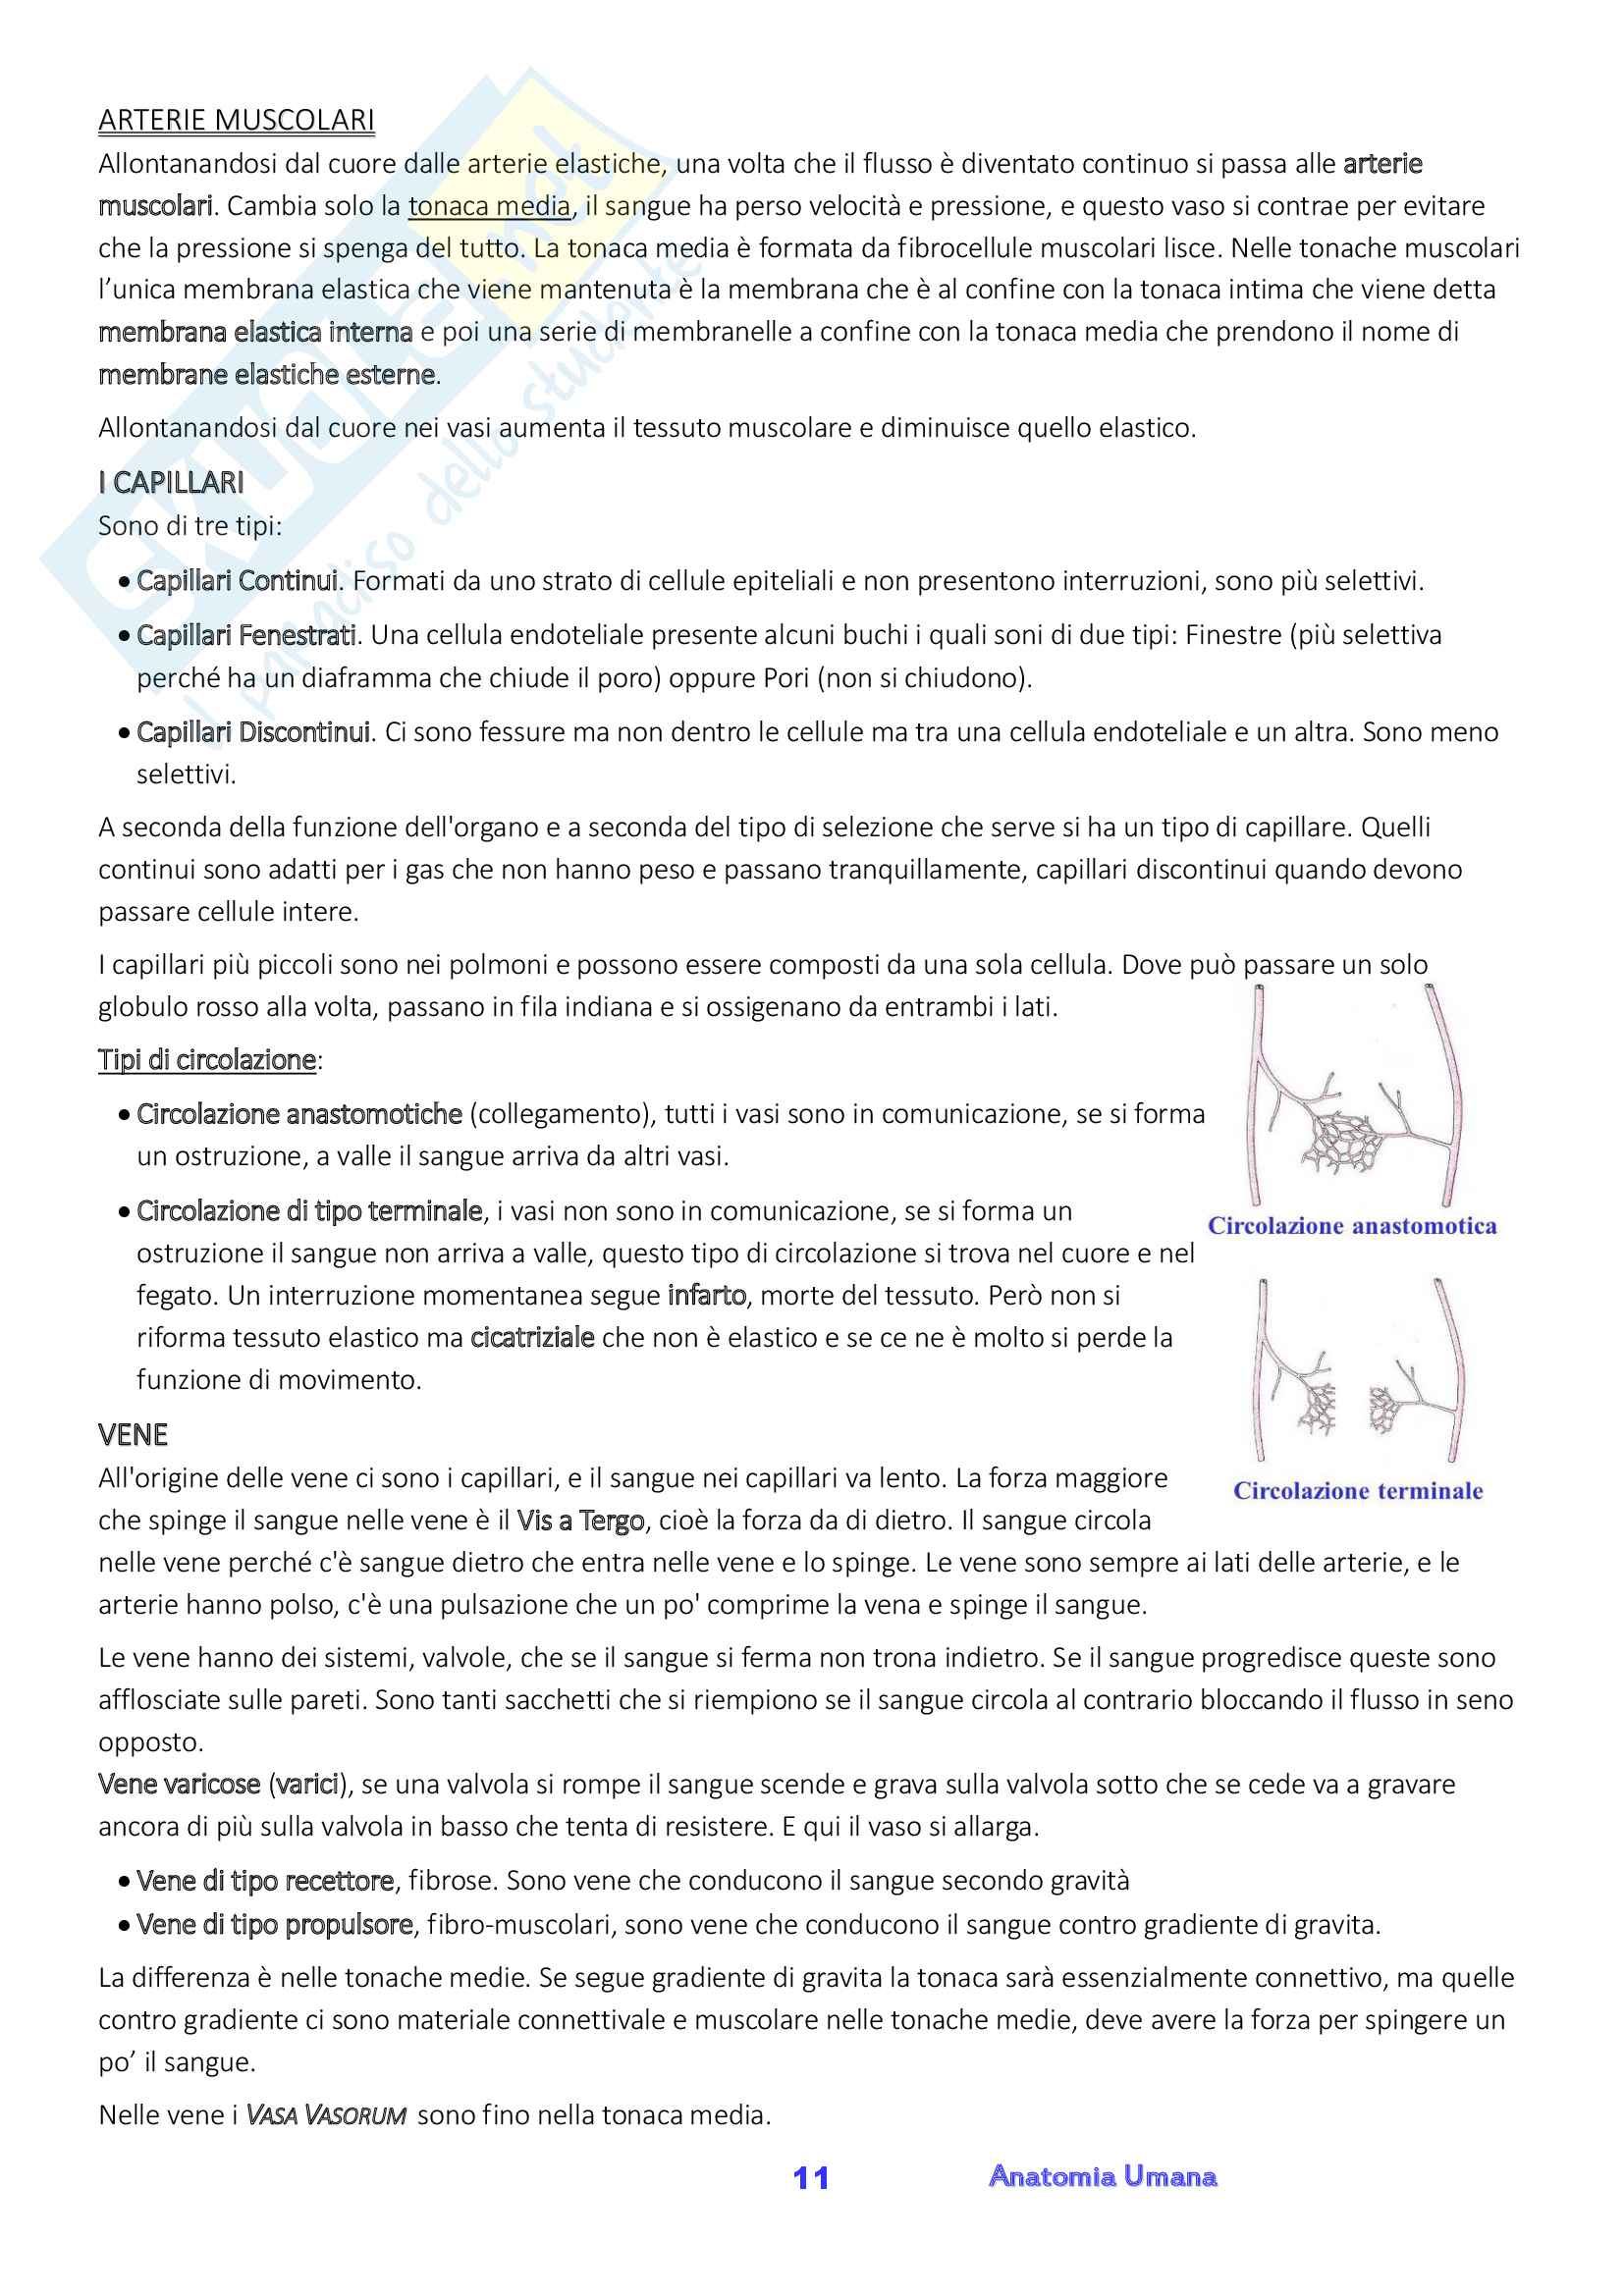 Anatomia umana, Appunti, Prof.ssa Ferretti Pag. 11